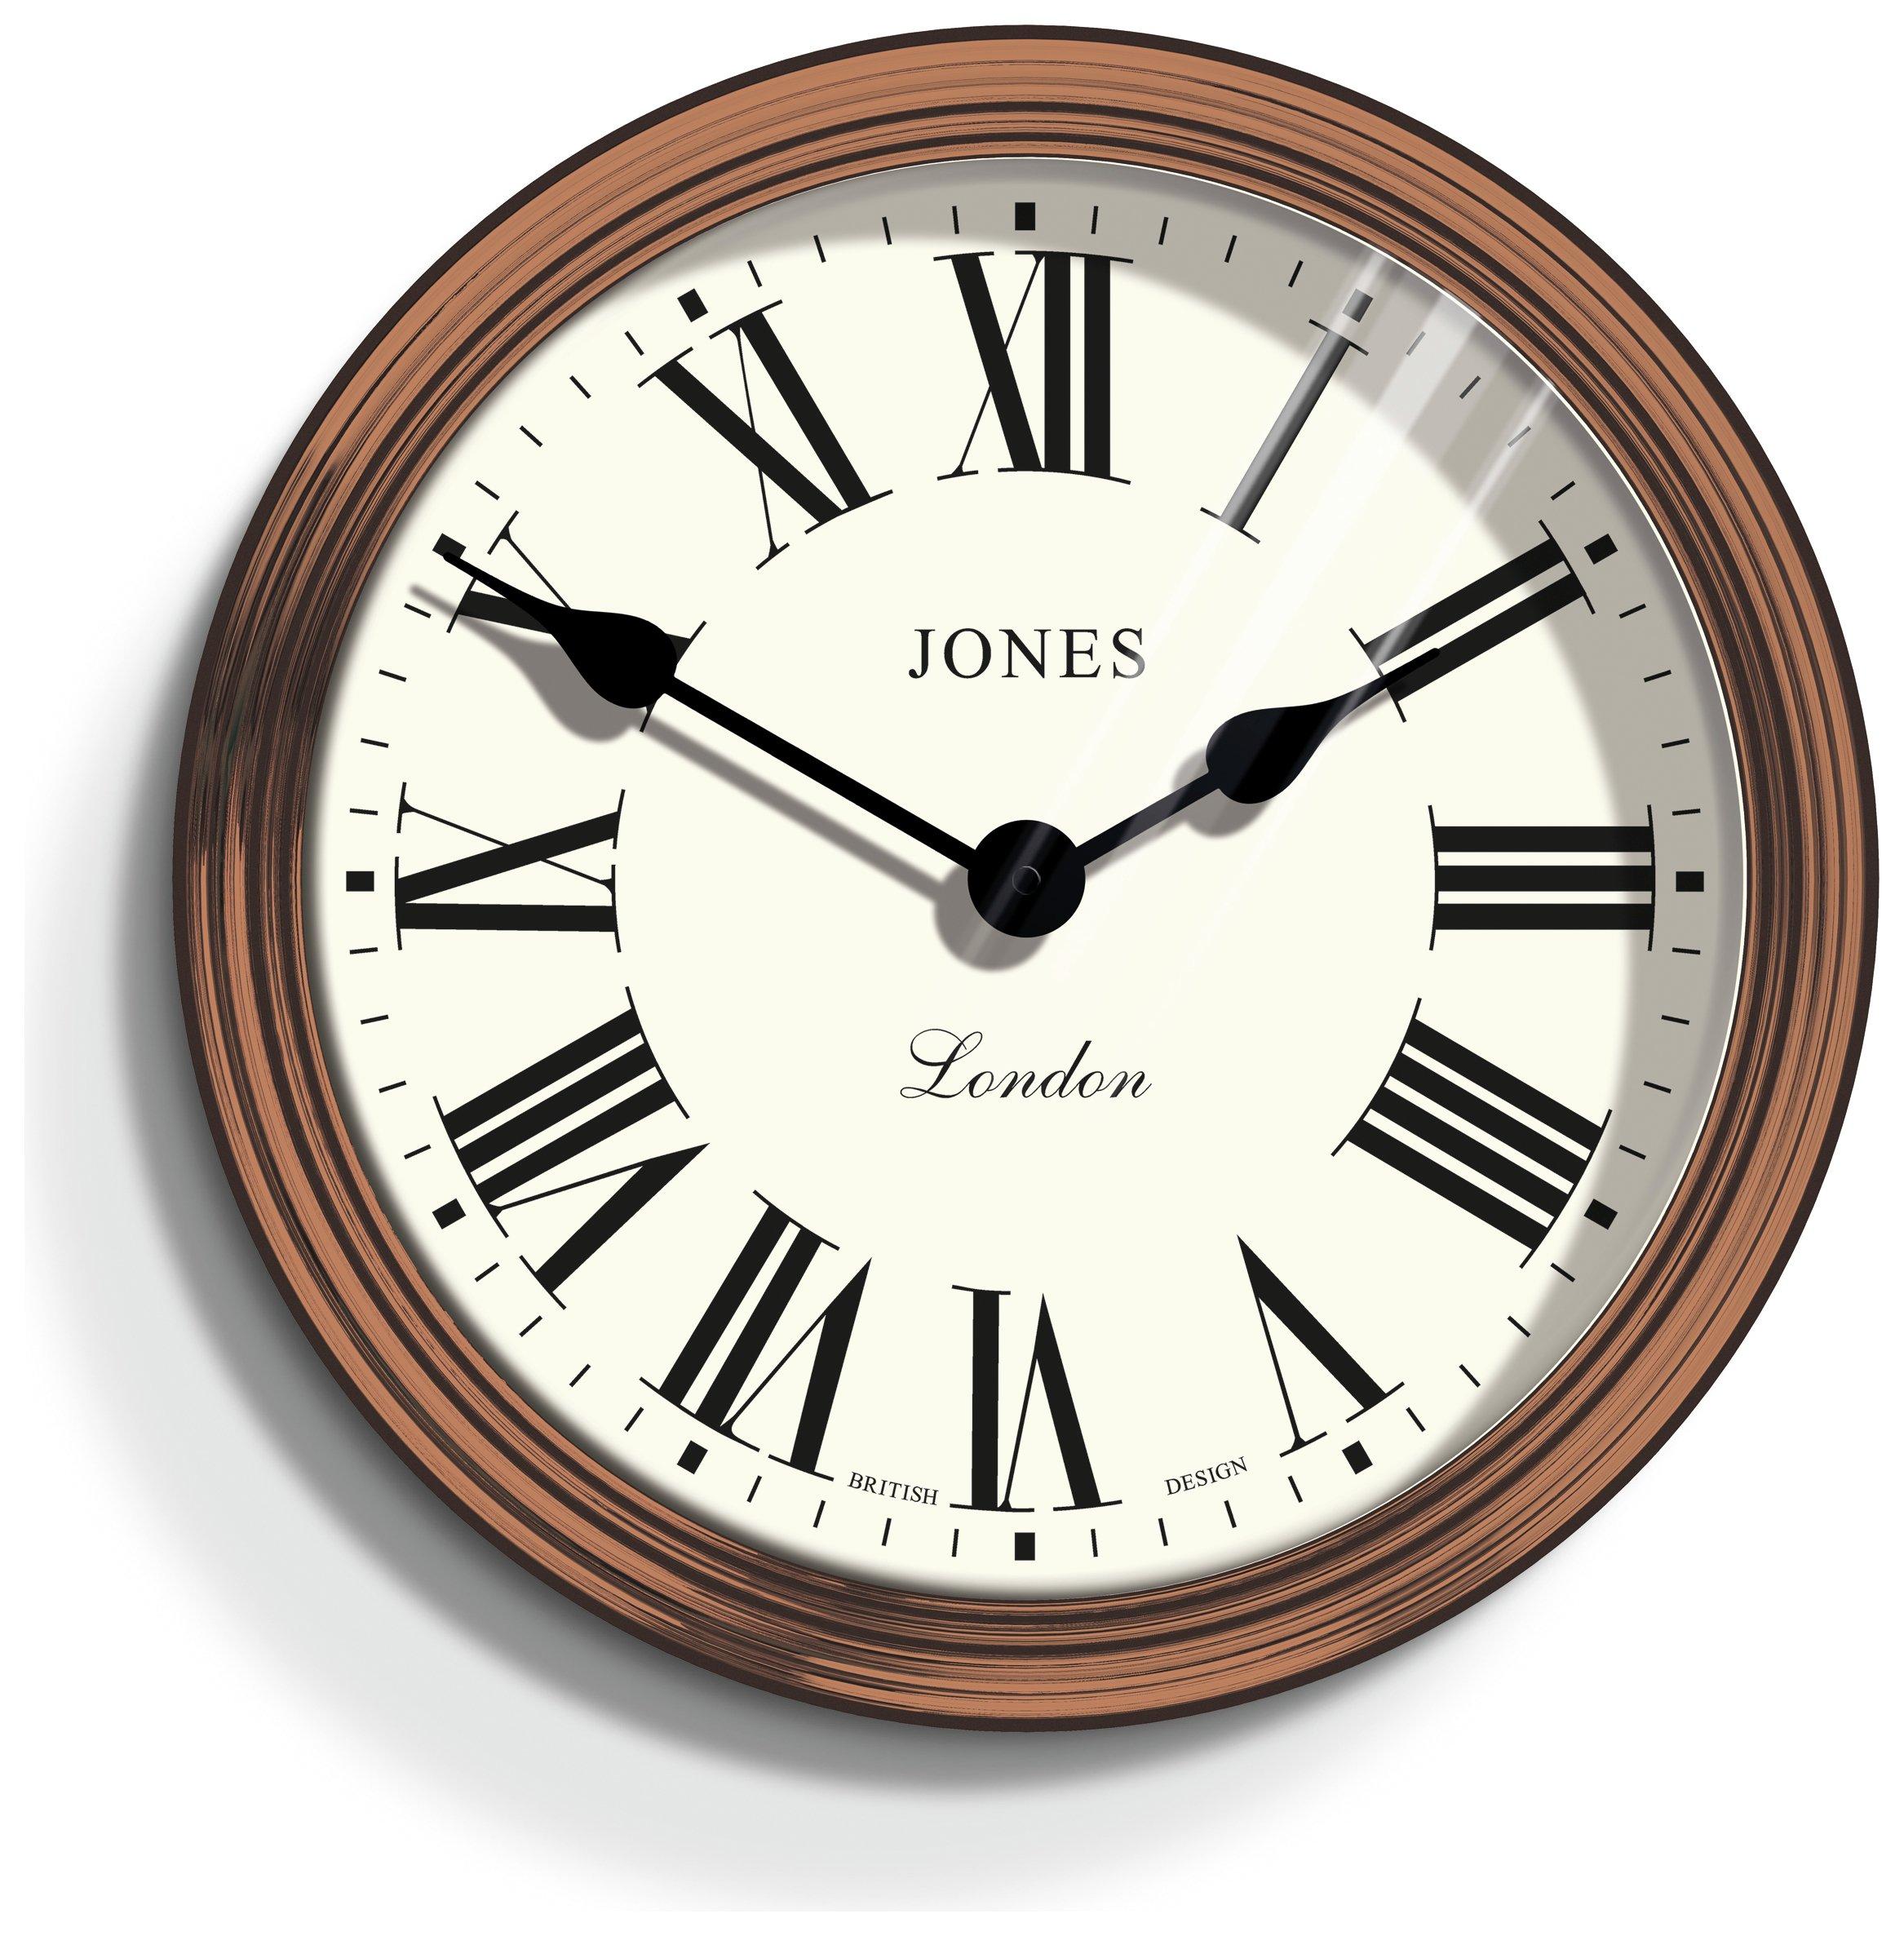 Buy Terracotta Garden Clocks At Argos Co Uk Your Online